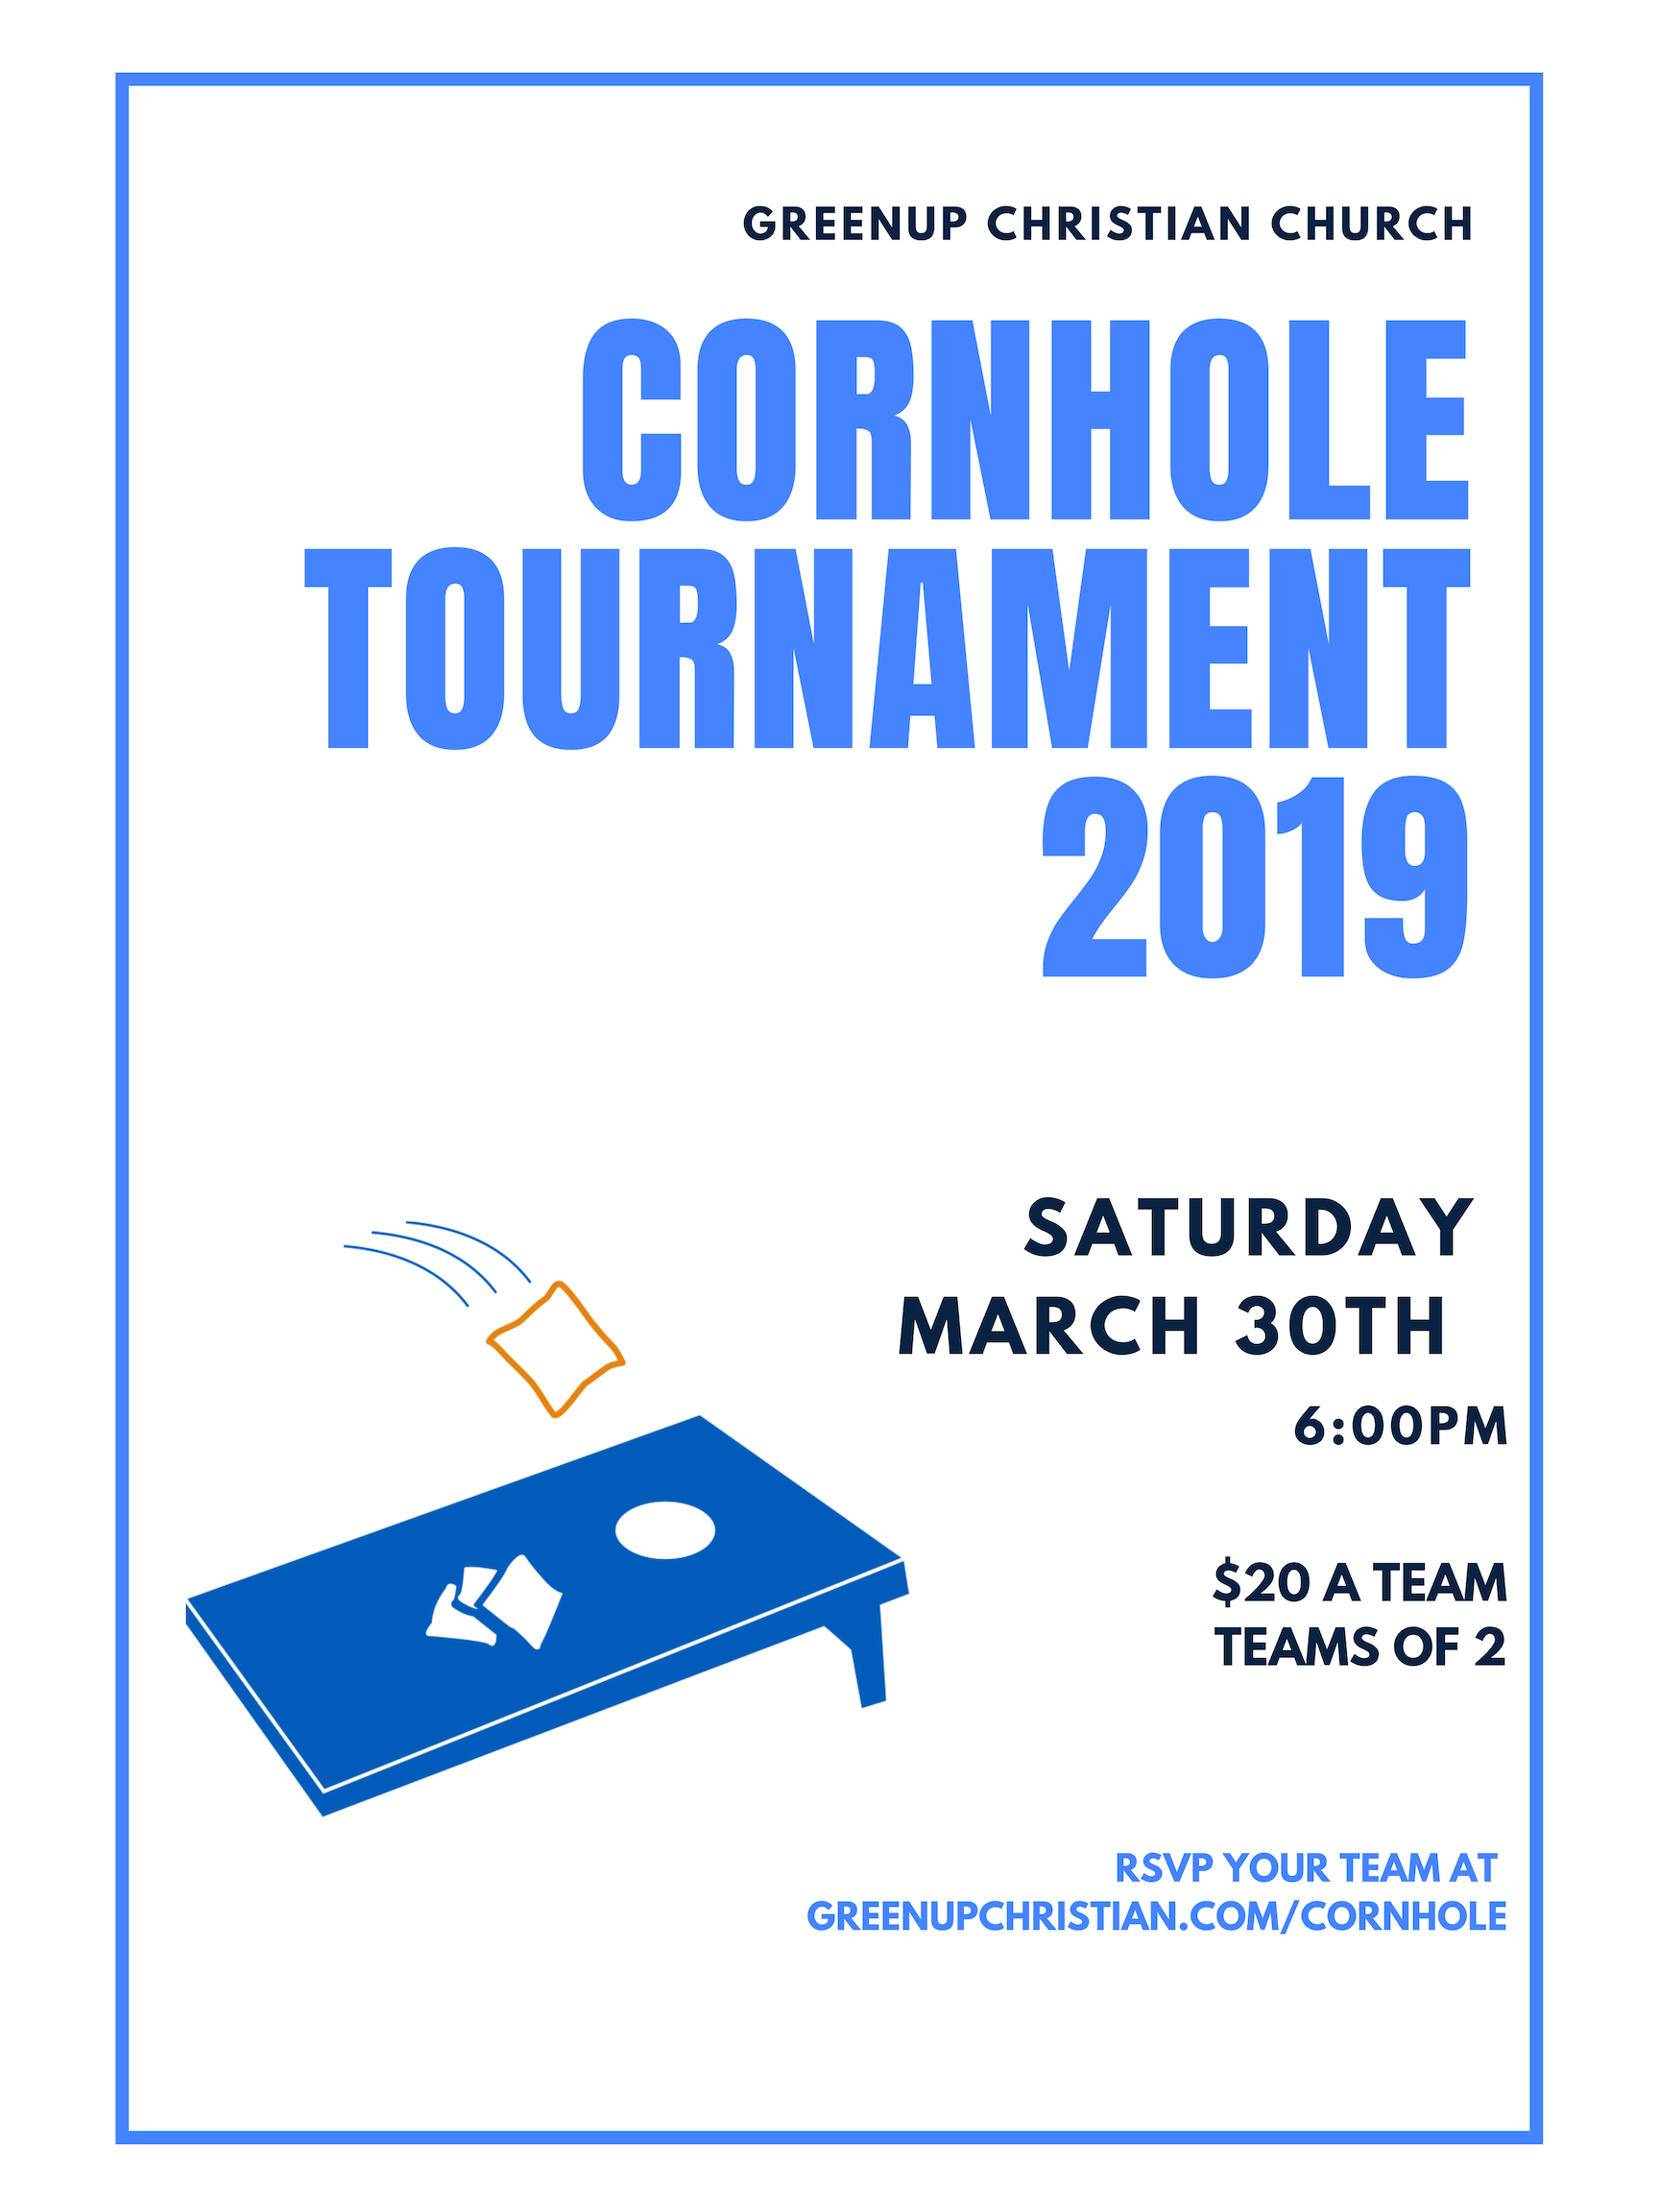 Cornhole tournament 2019 (2).png